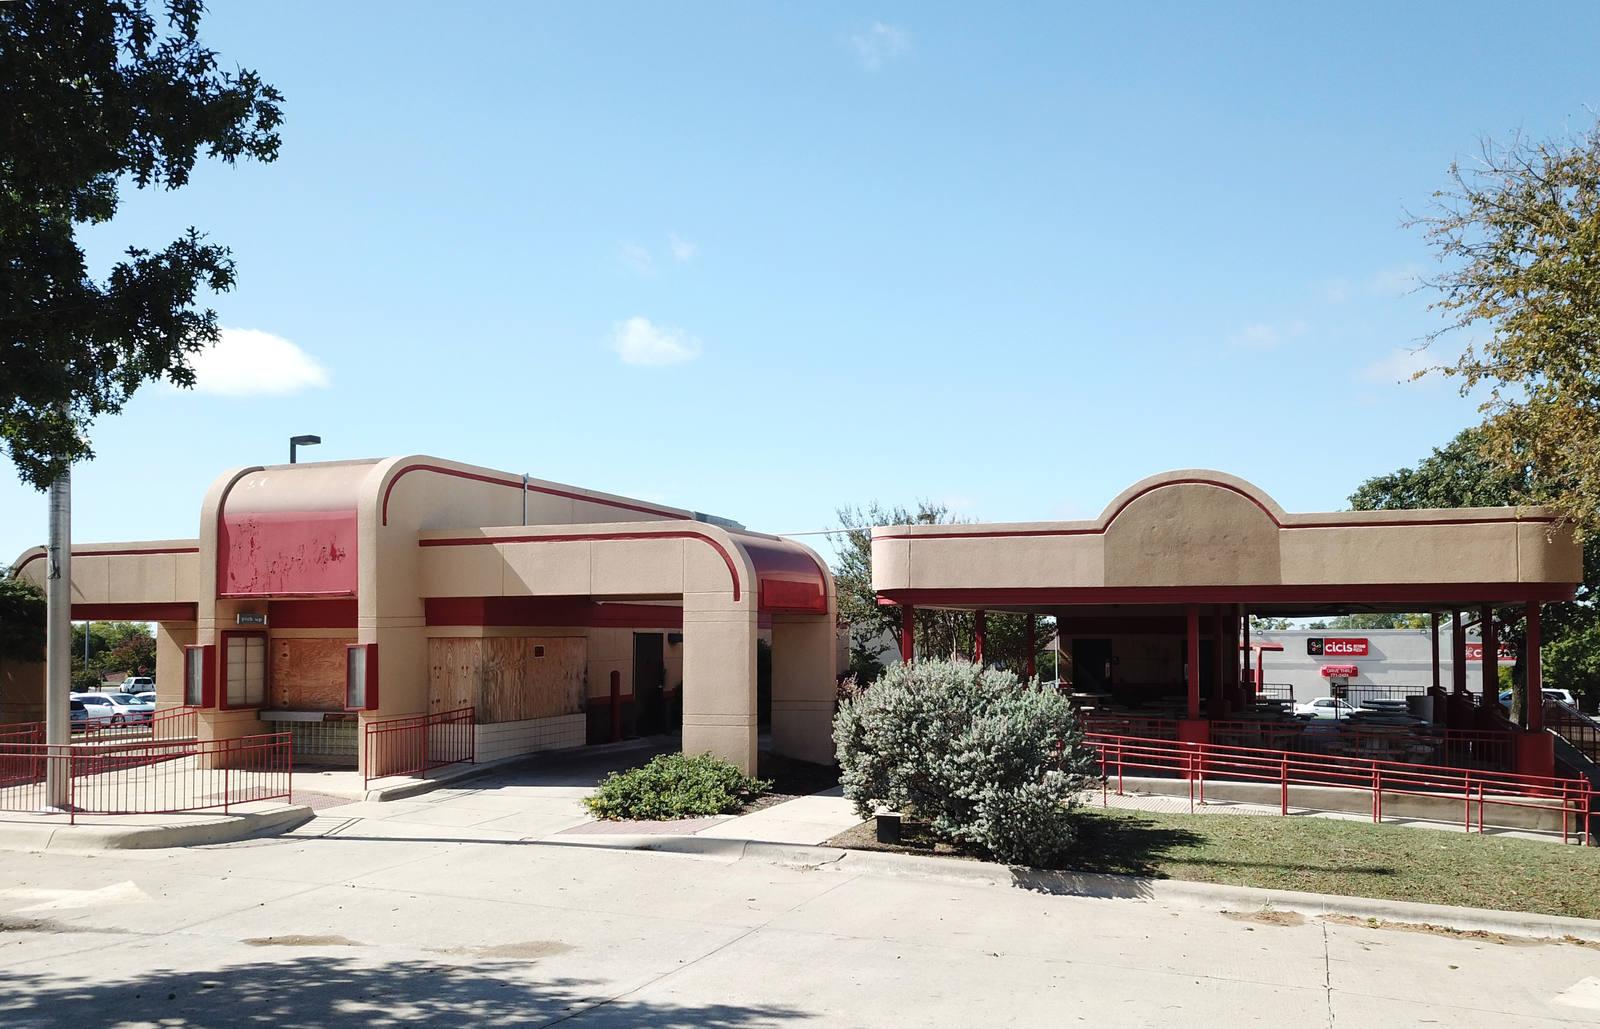 CBRE RetailTemple TX Former Restaurant with Drive-Thru Redevelopment Opportunity3306 S 31st Street  Photo